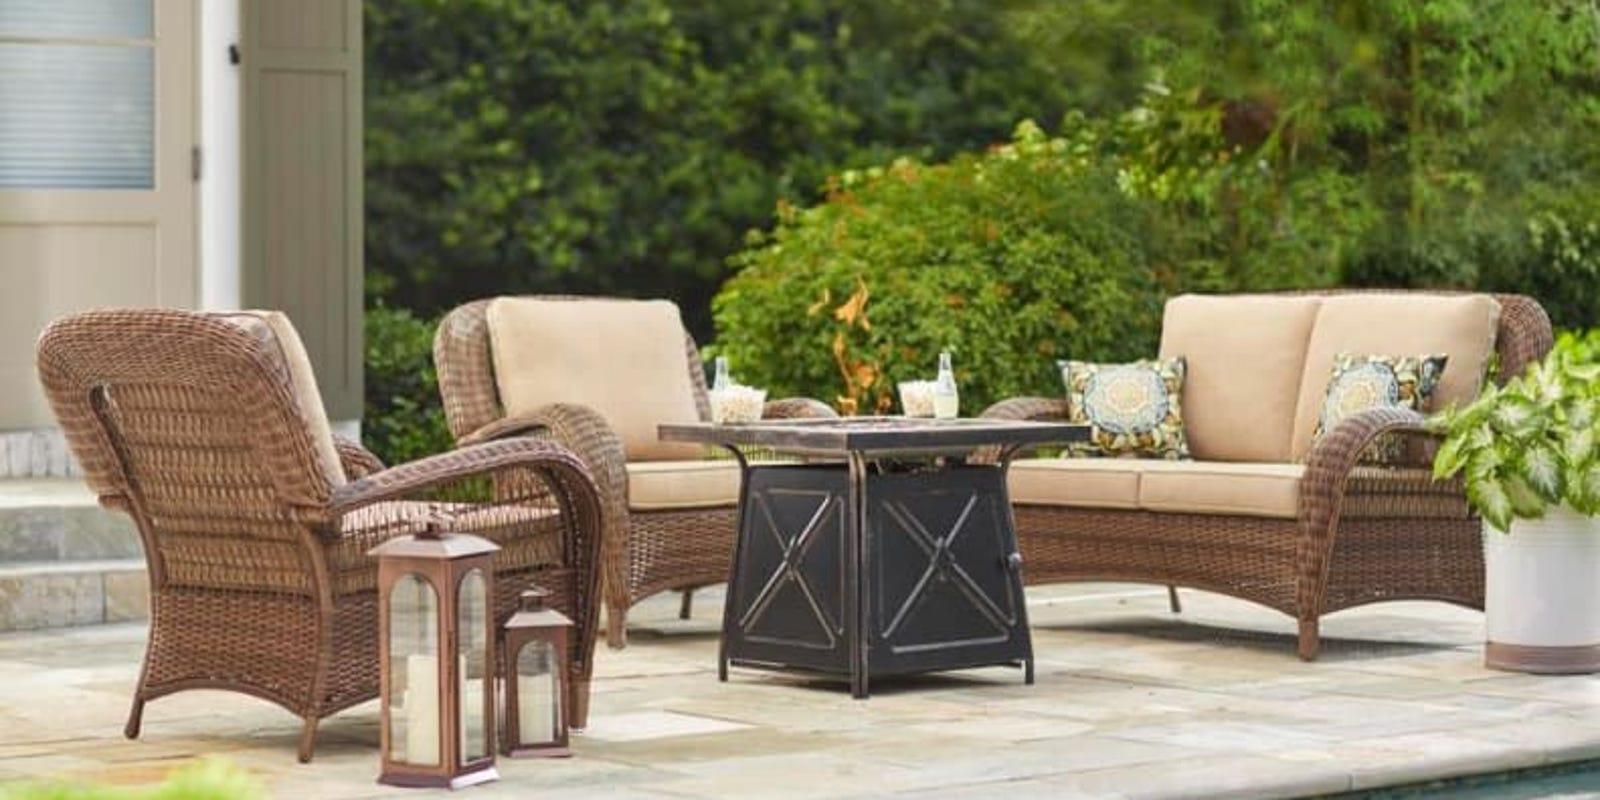 Outdoor Patio Furniture Giving Aesthetical Pleasure